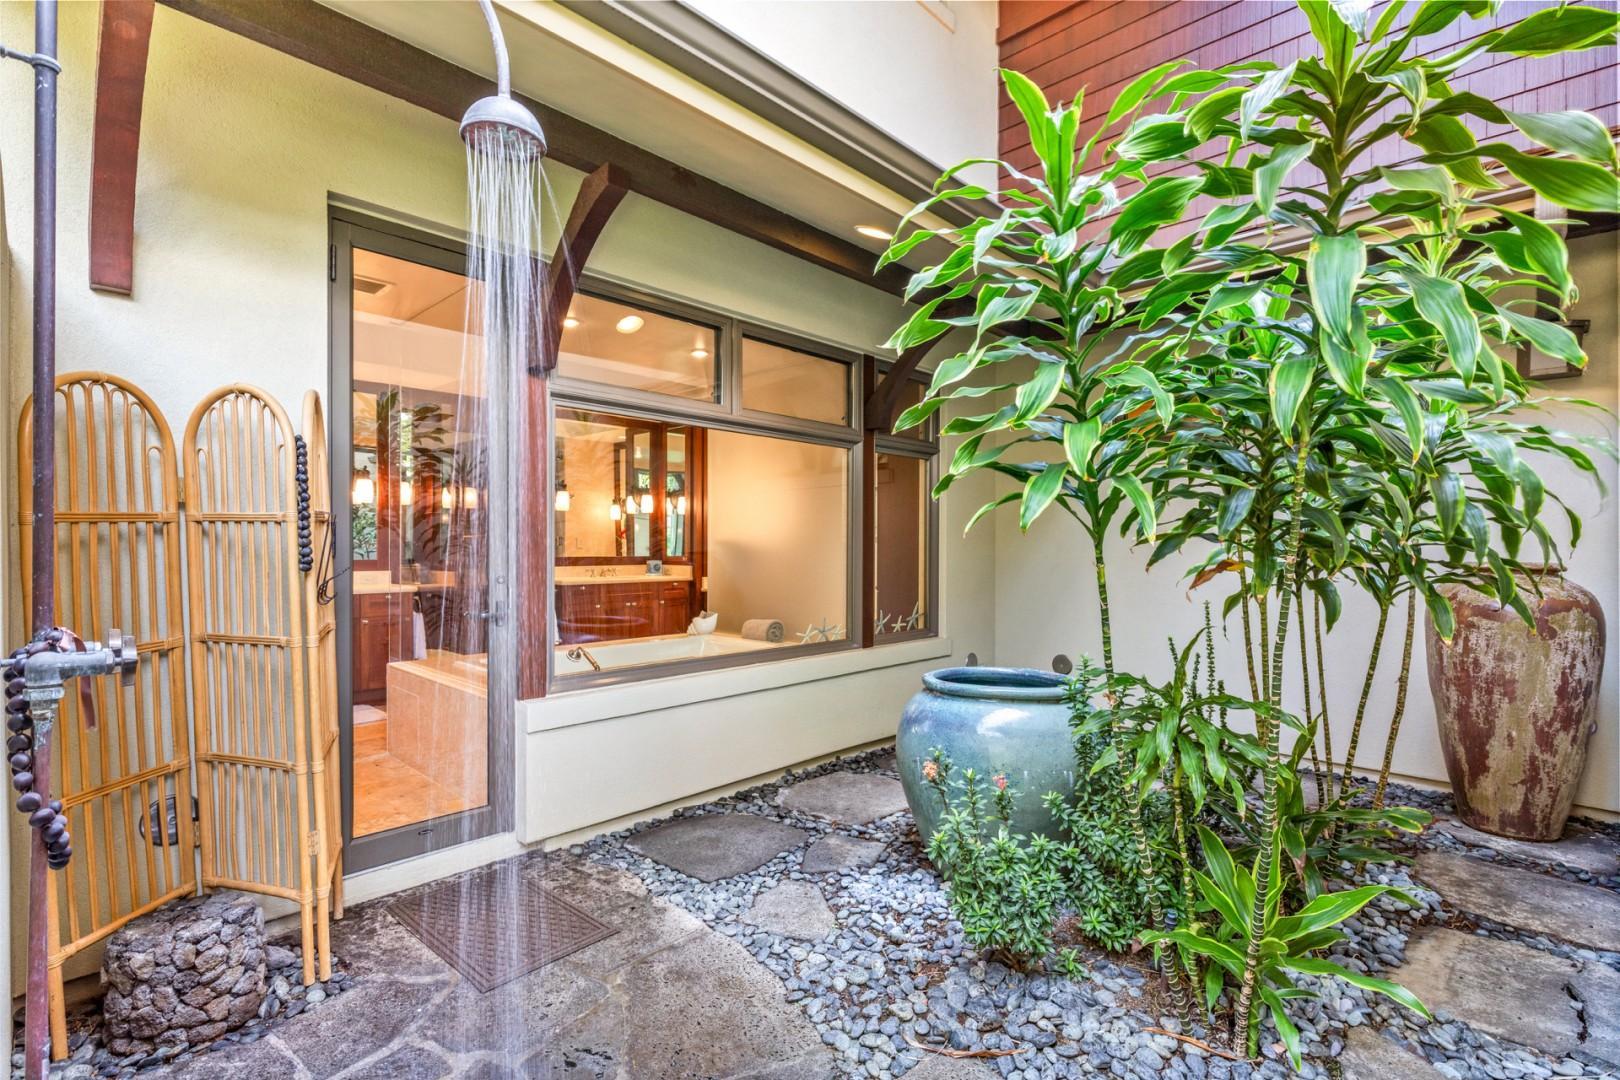 Outdoor shower garden off master bath - a tropical treat!